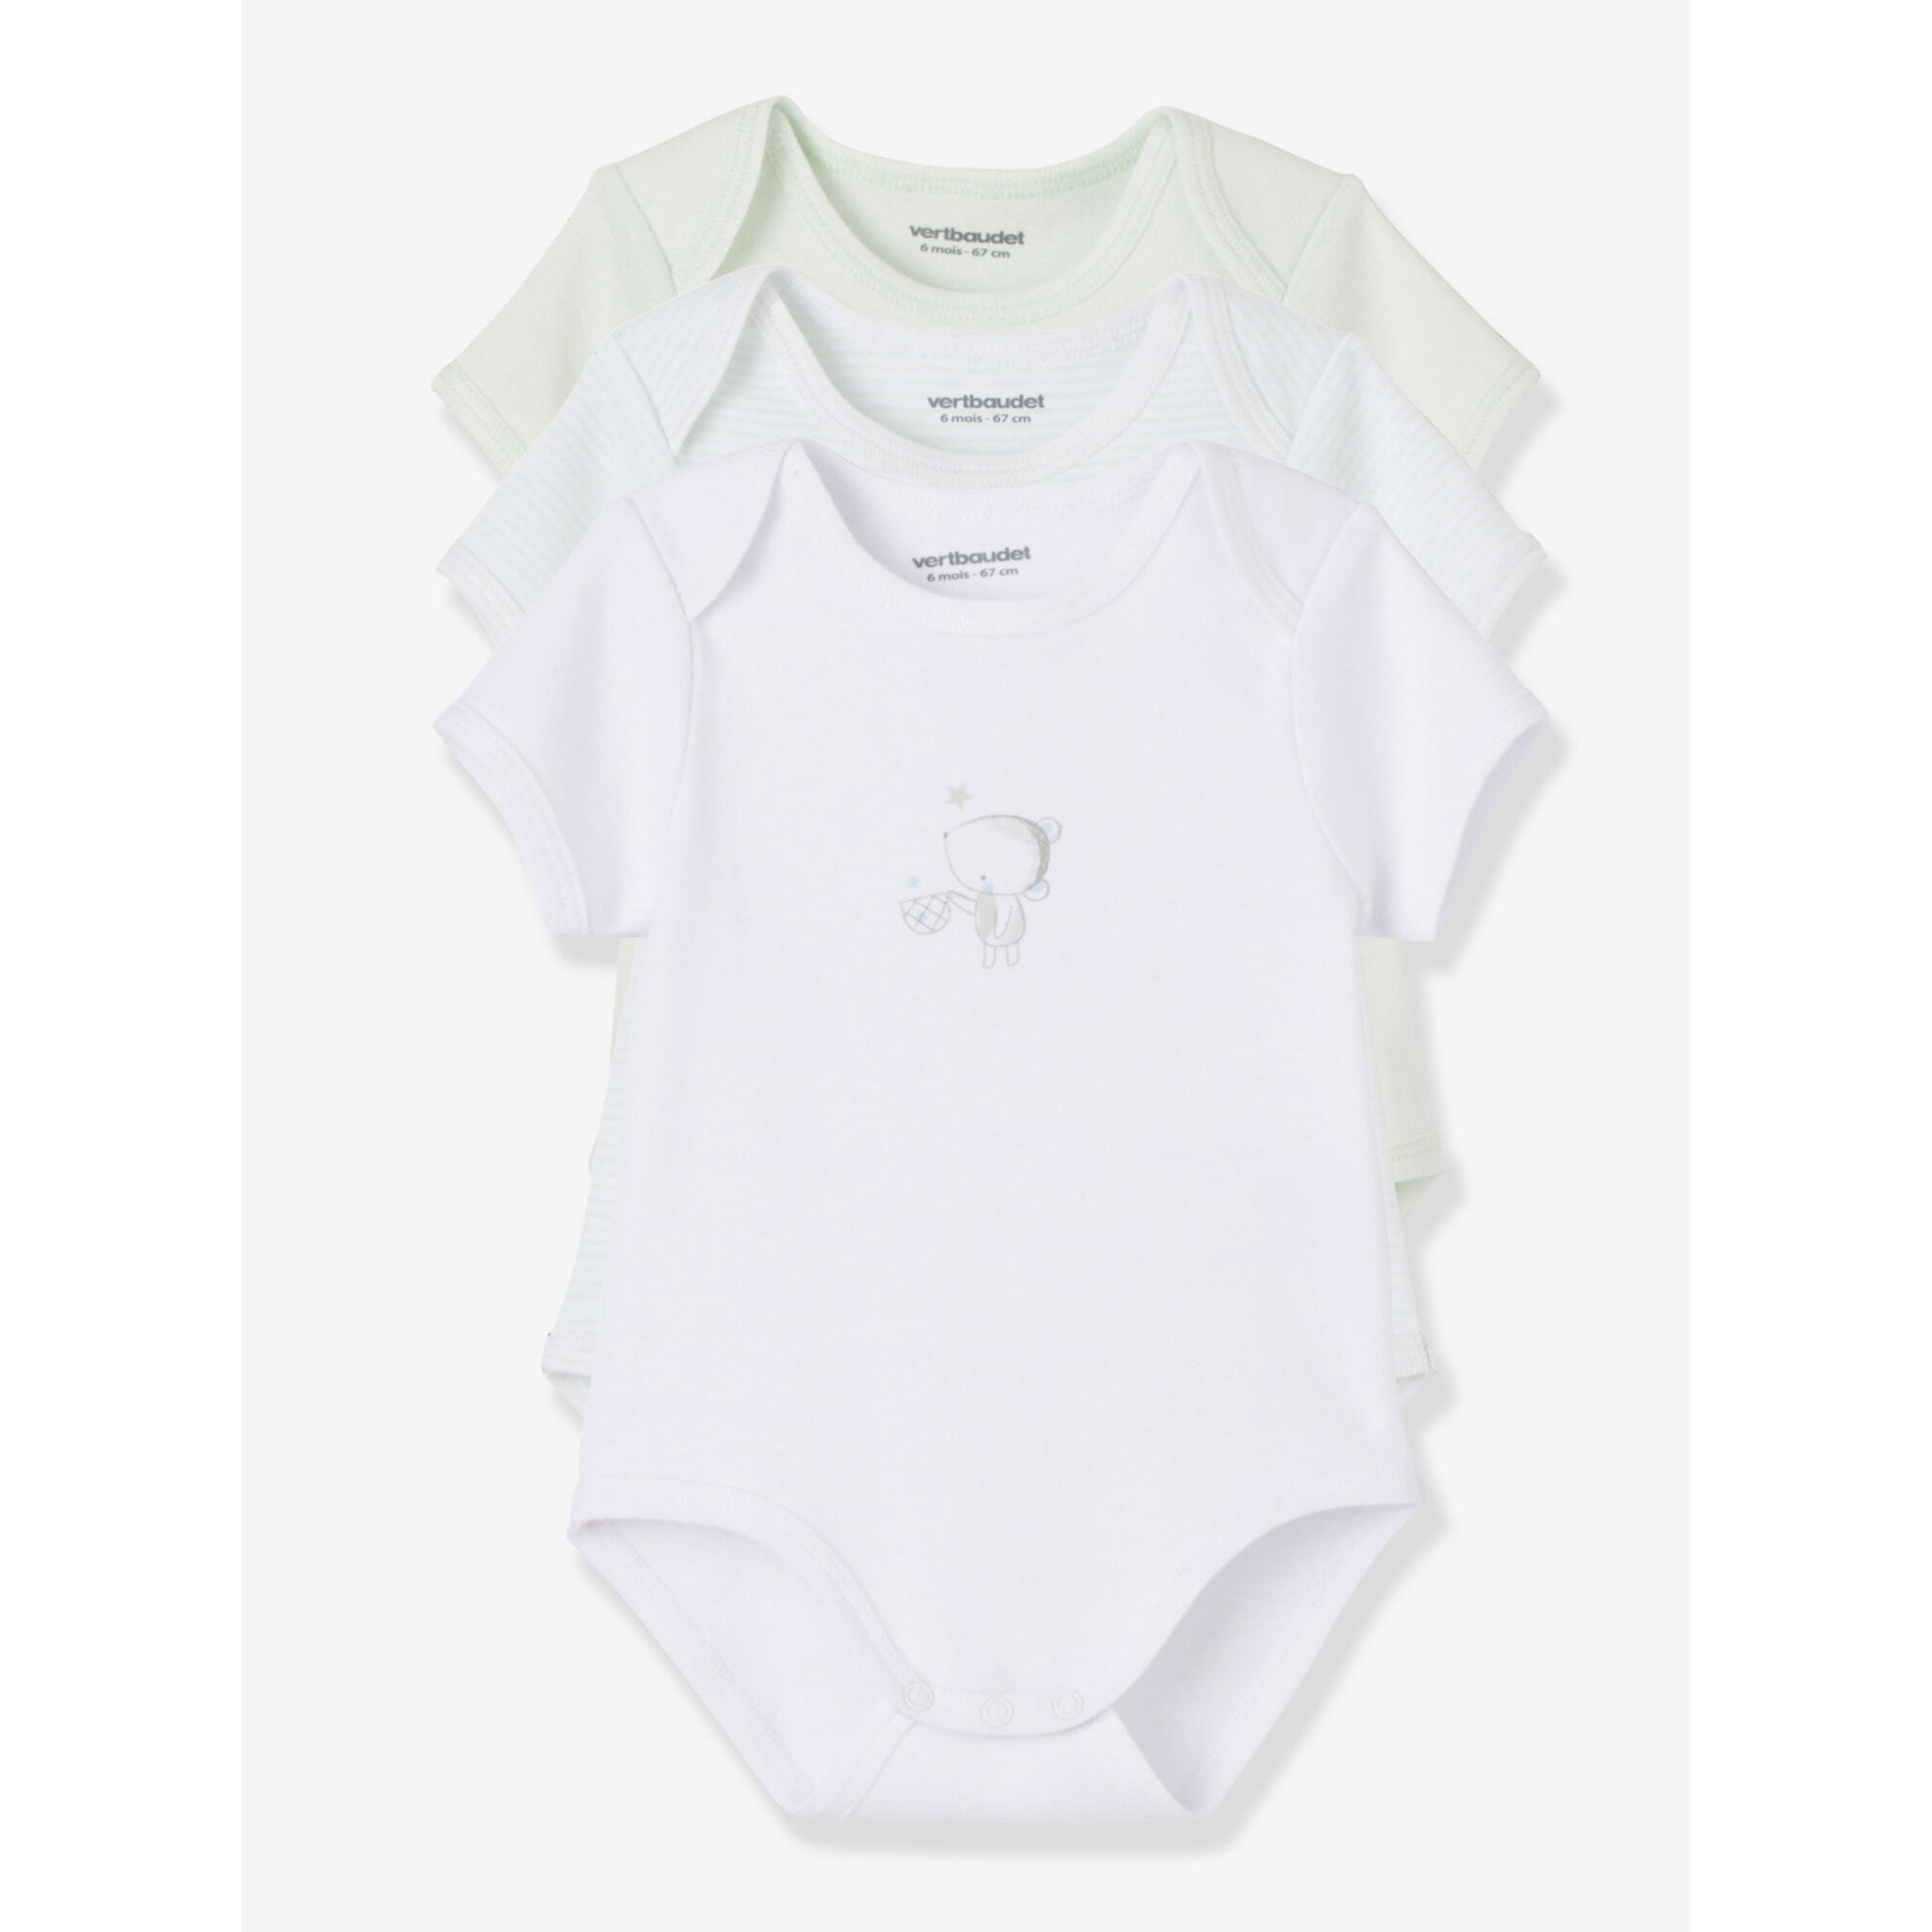 vertbaudet-3er-pack-bodys-fur-babys-kurze-armel, 11.99 EUR @ babywalz-de